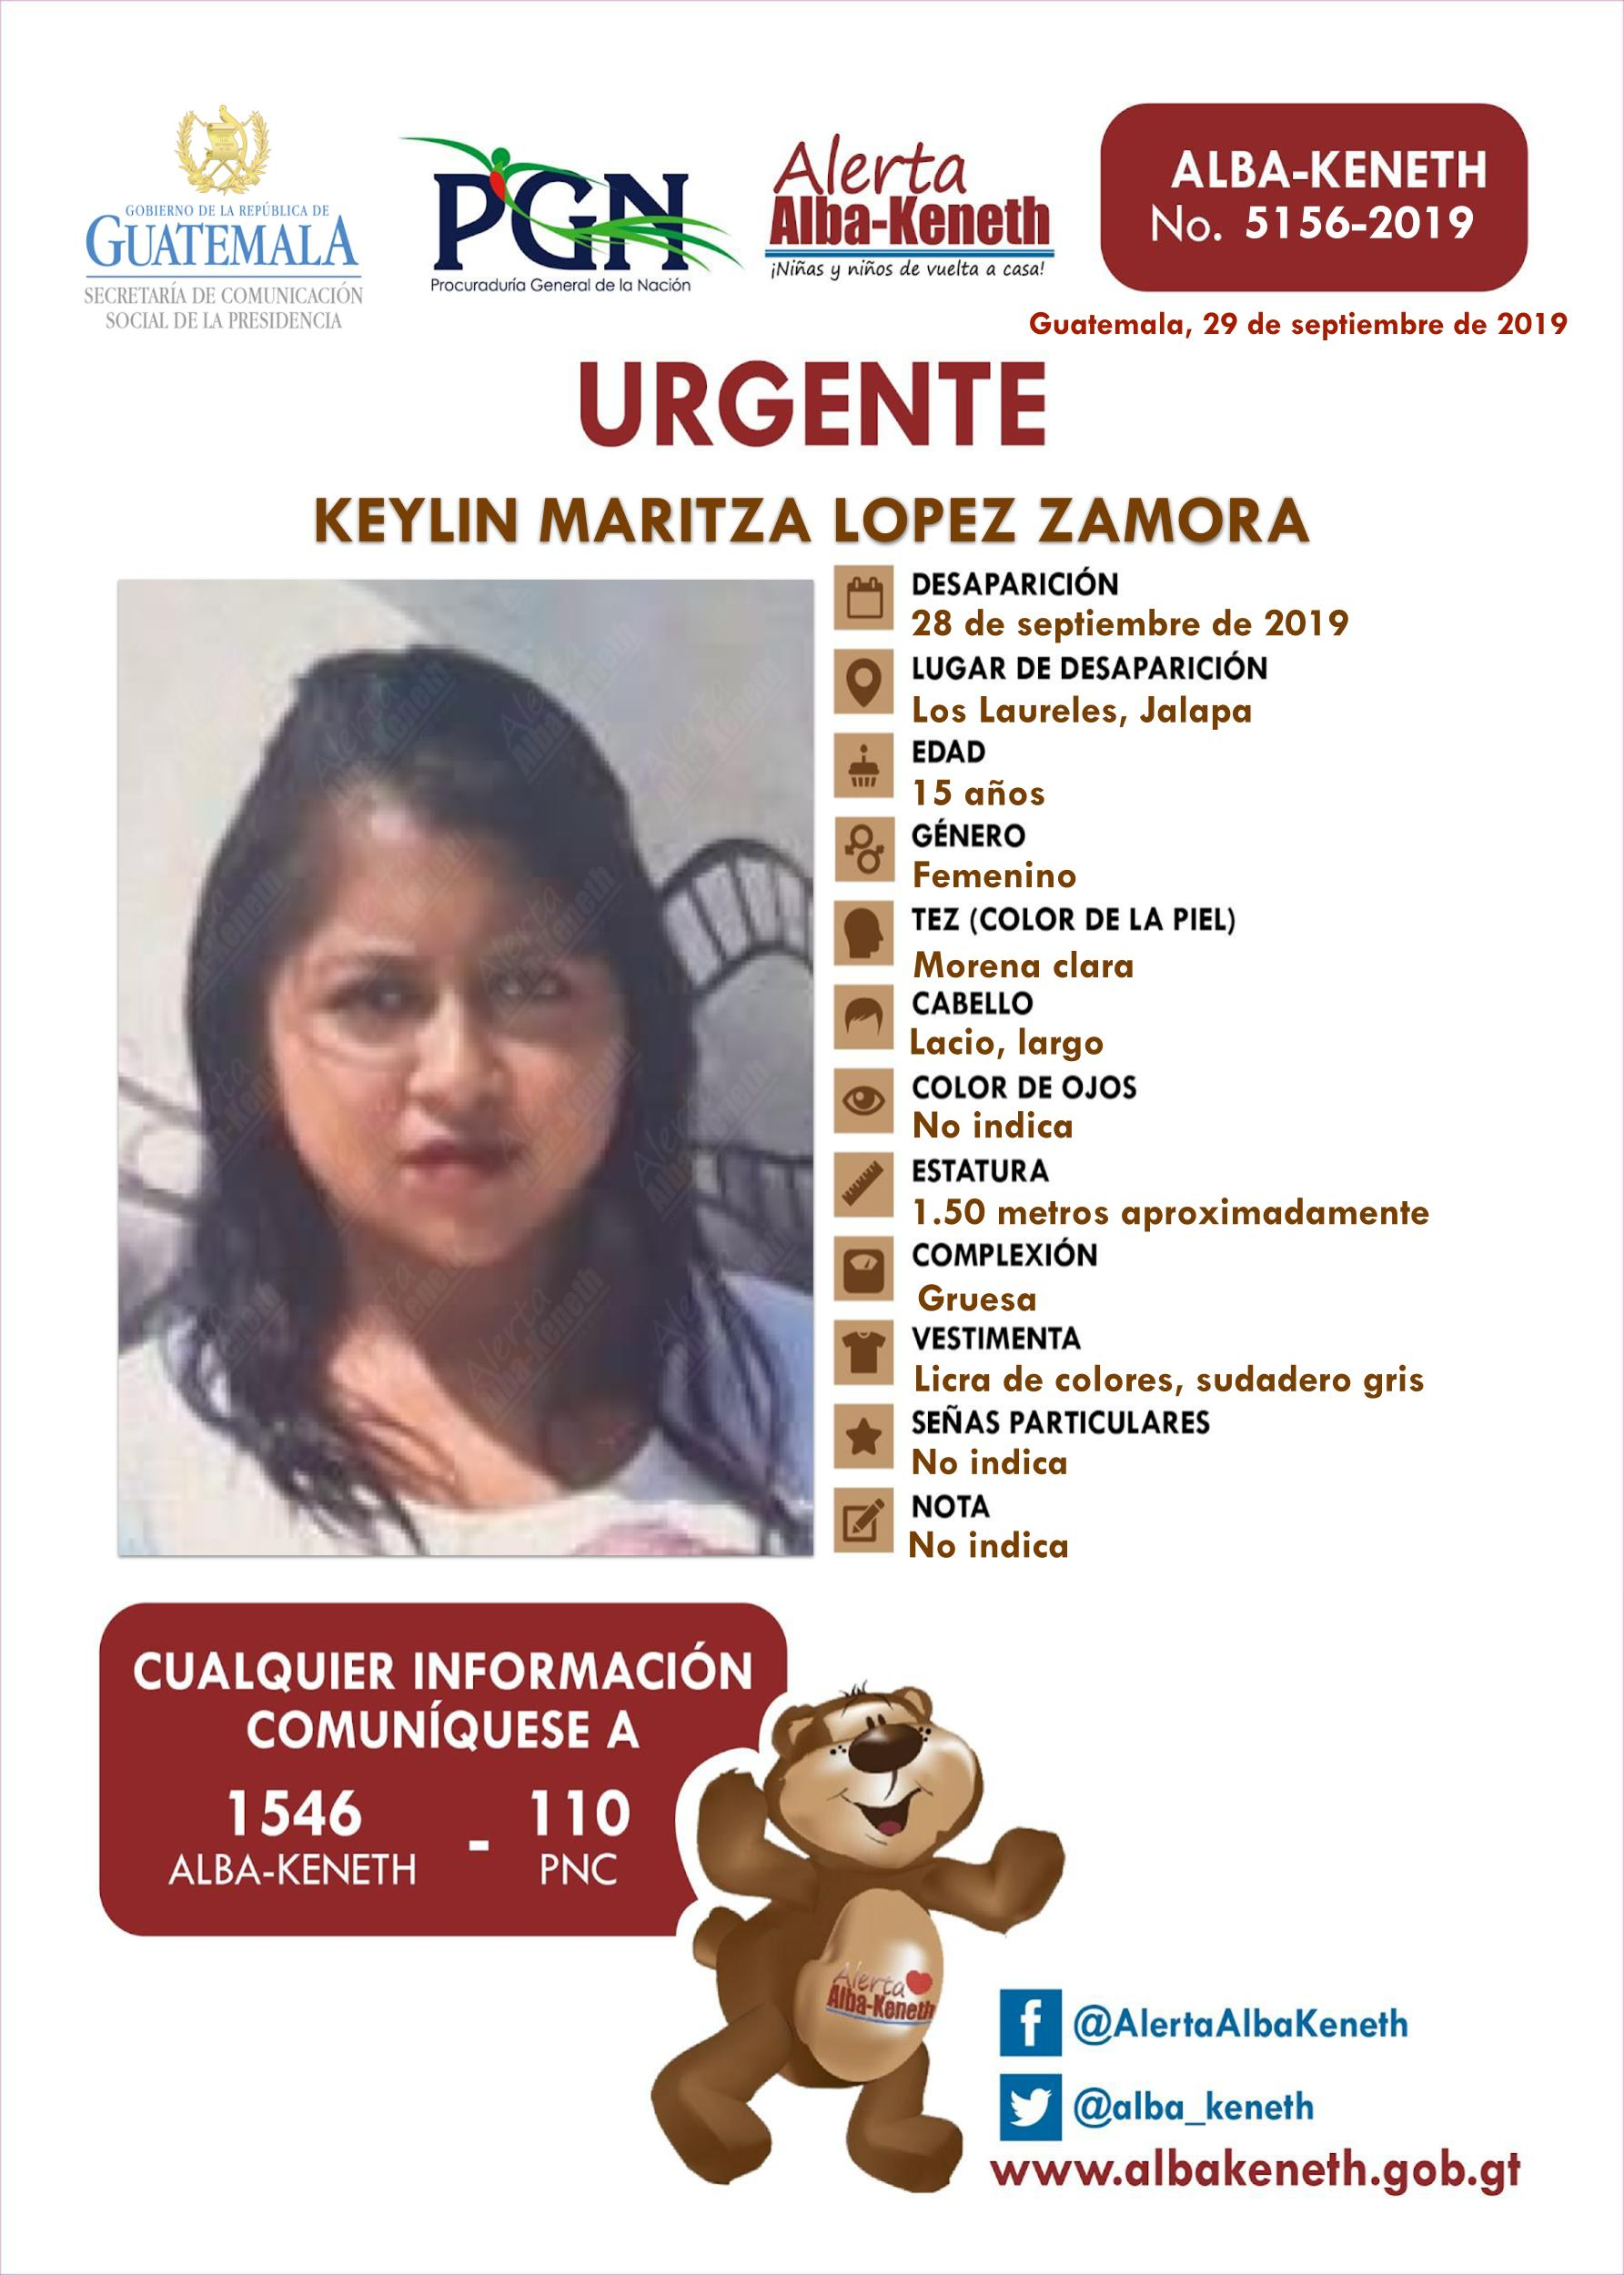 Keylin Maritza Lopez Zamora